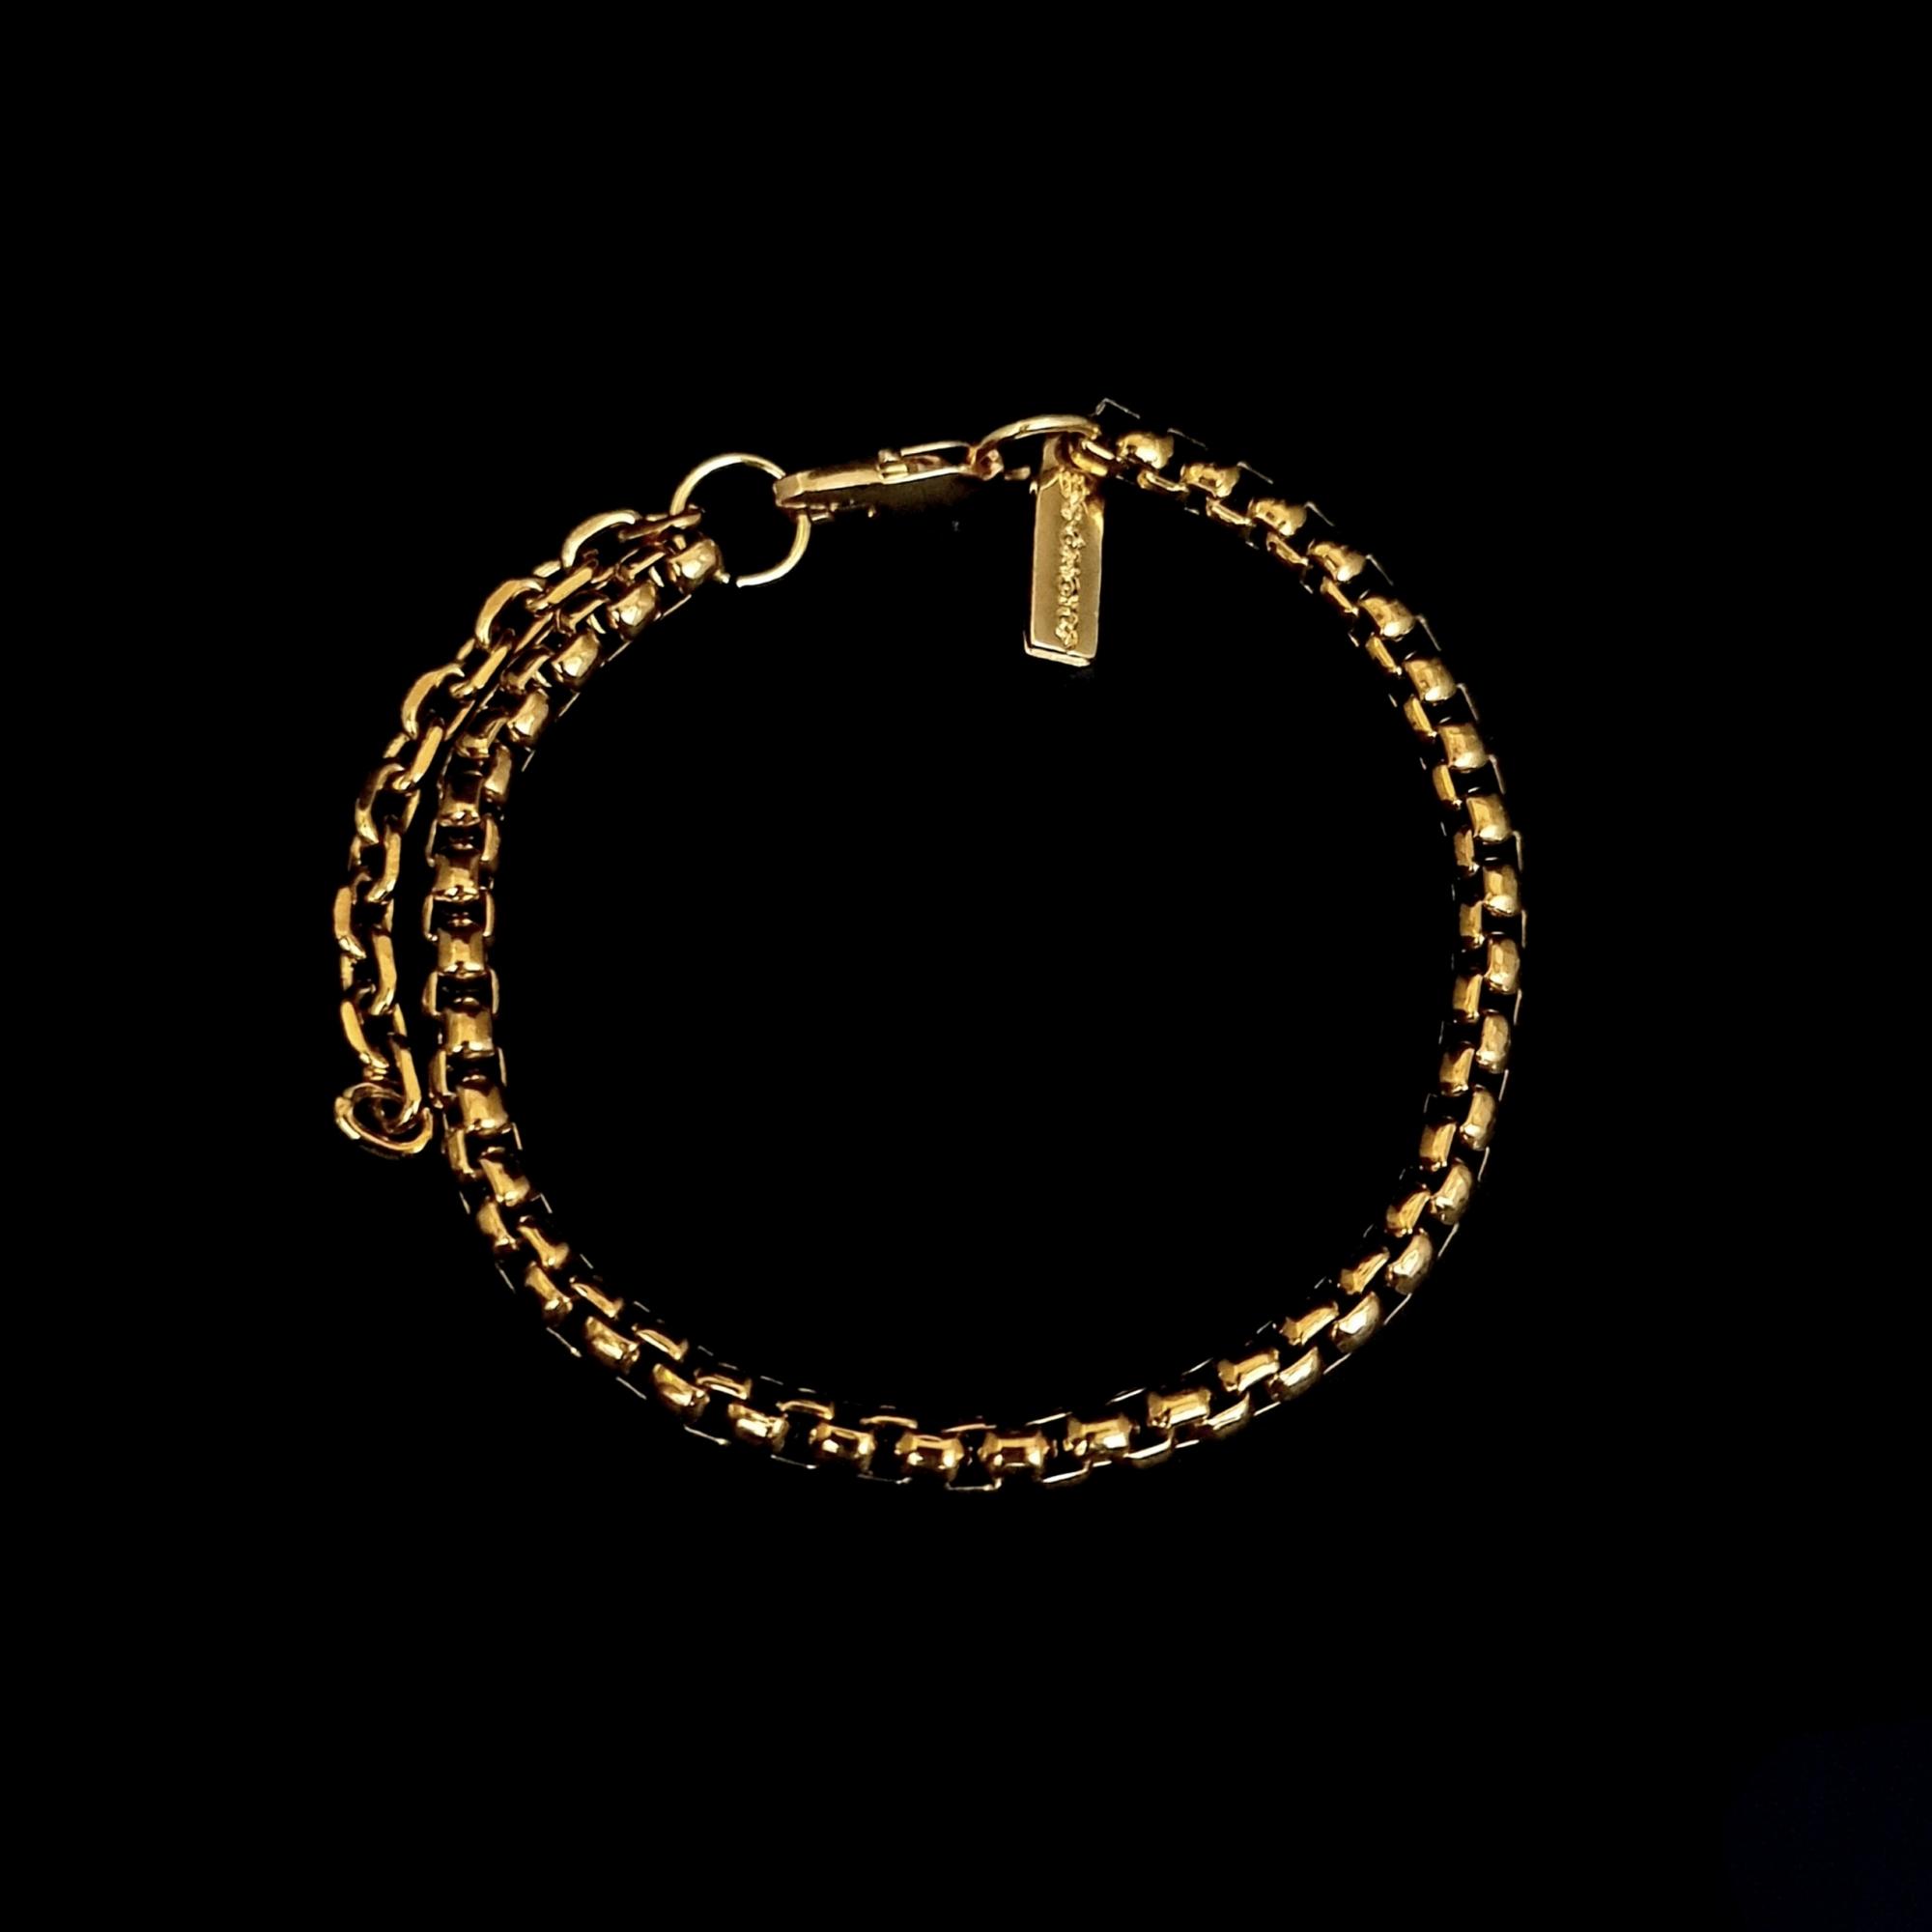 Pulseira Aço Inox Trava Gold